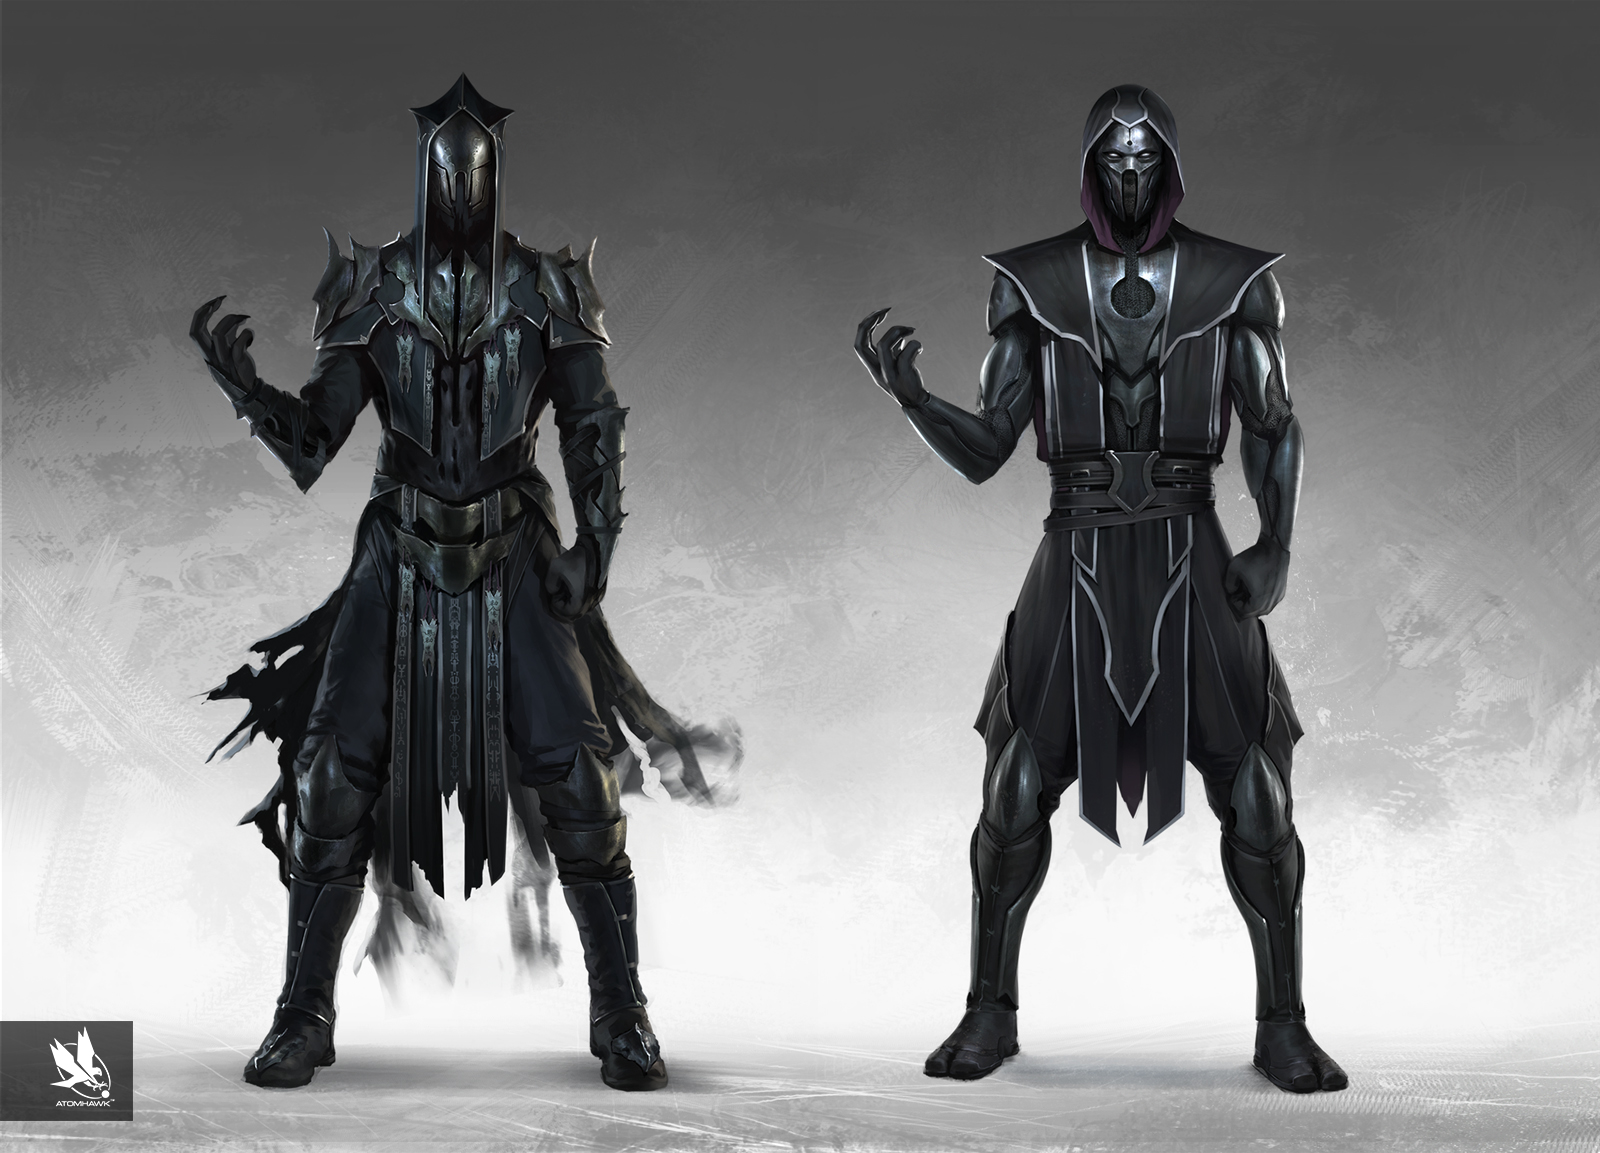 Atomhawk_Warner-Bros-NetherRealm_Mortal-Kombat-11_Concept-Art_Character-Design_Side-by-Side_Noob-Saibot.jpg